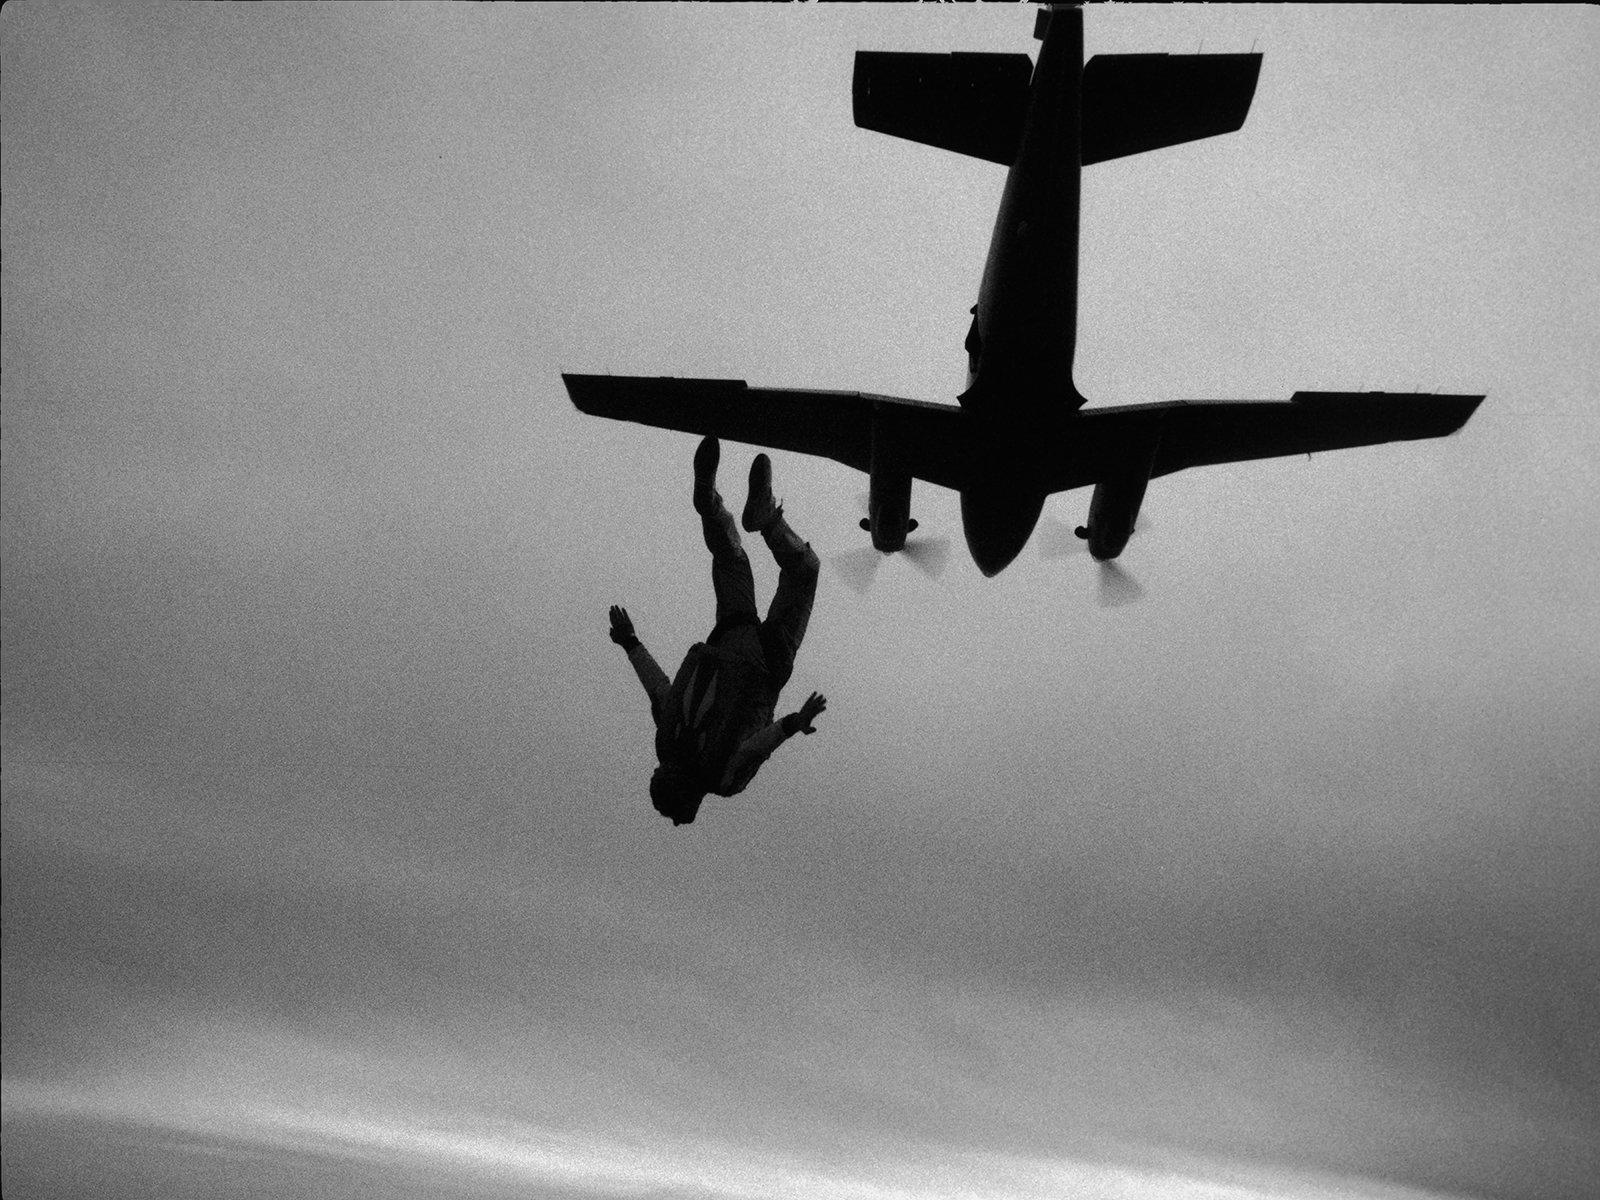 Skydiving Poster Sky Diving Skydive Parachuting 24x36